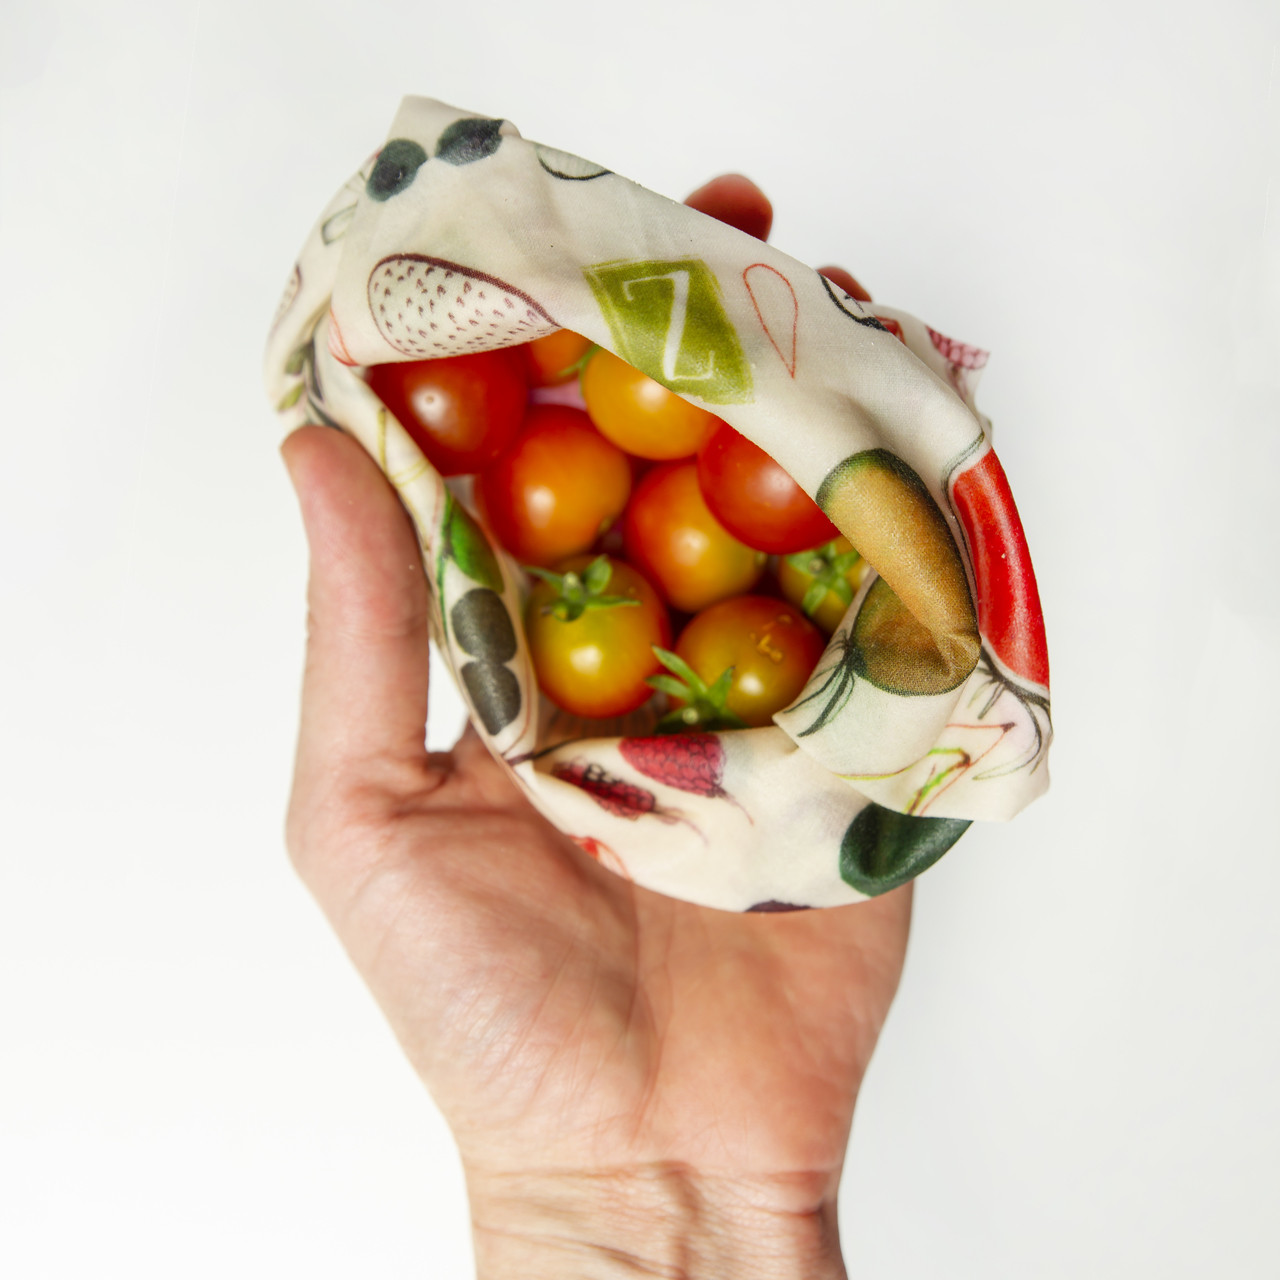 ZWraps Reusable Beeswax Food Wrap - Multi-Pack: Small, Medium, Large - Farmer's Market (ZW MP FM)